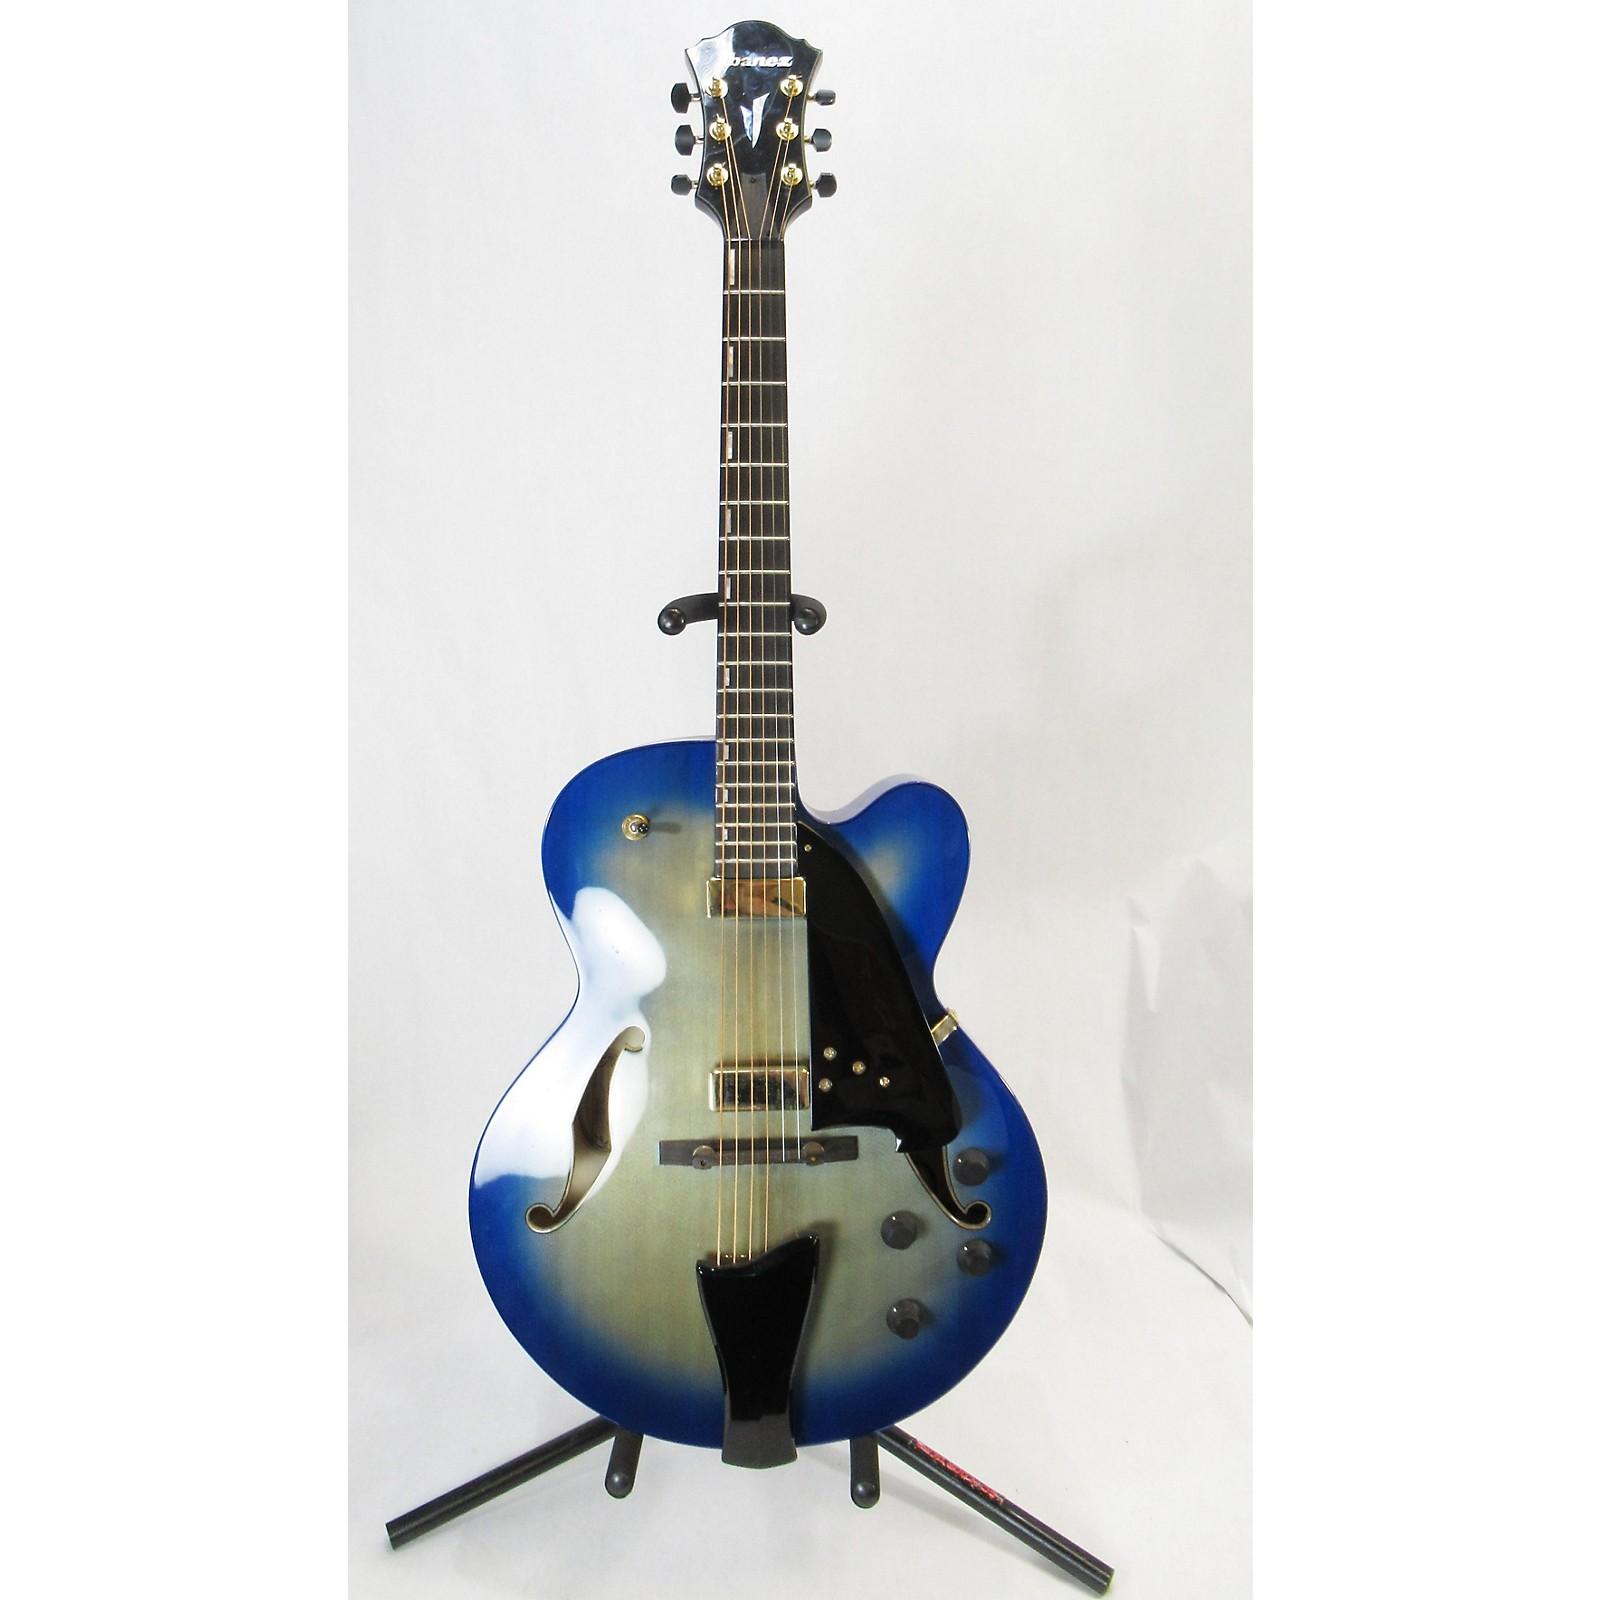 Ibanez AFC155JB1201 Hollow Body Electric Guitar